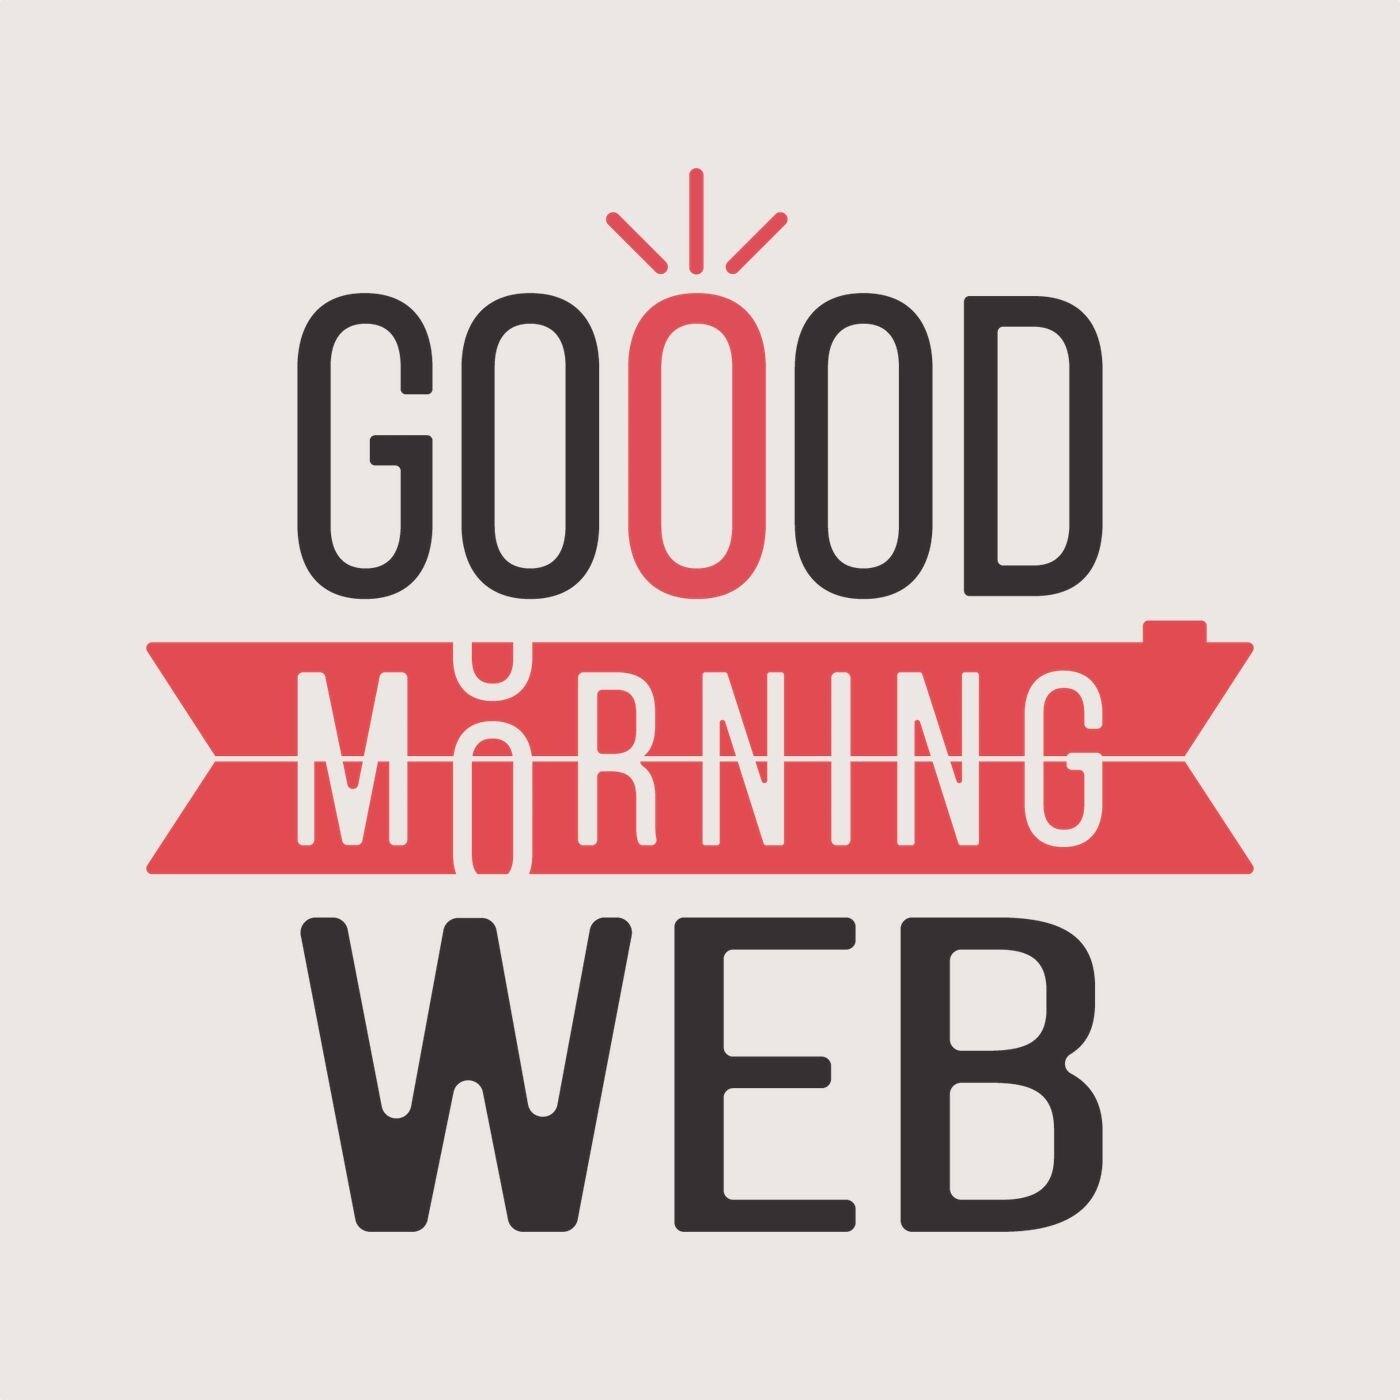 Goood Morning Web 2020 - #36